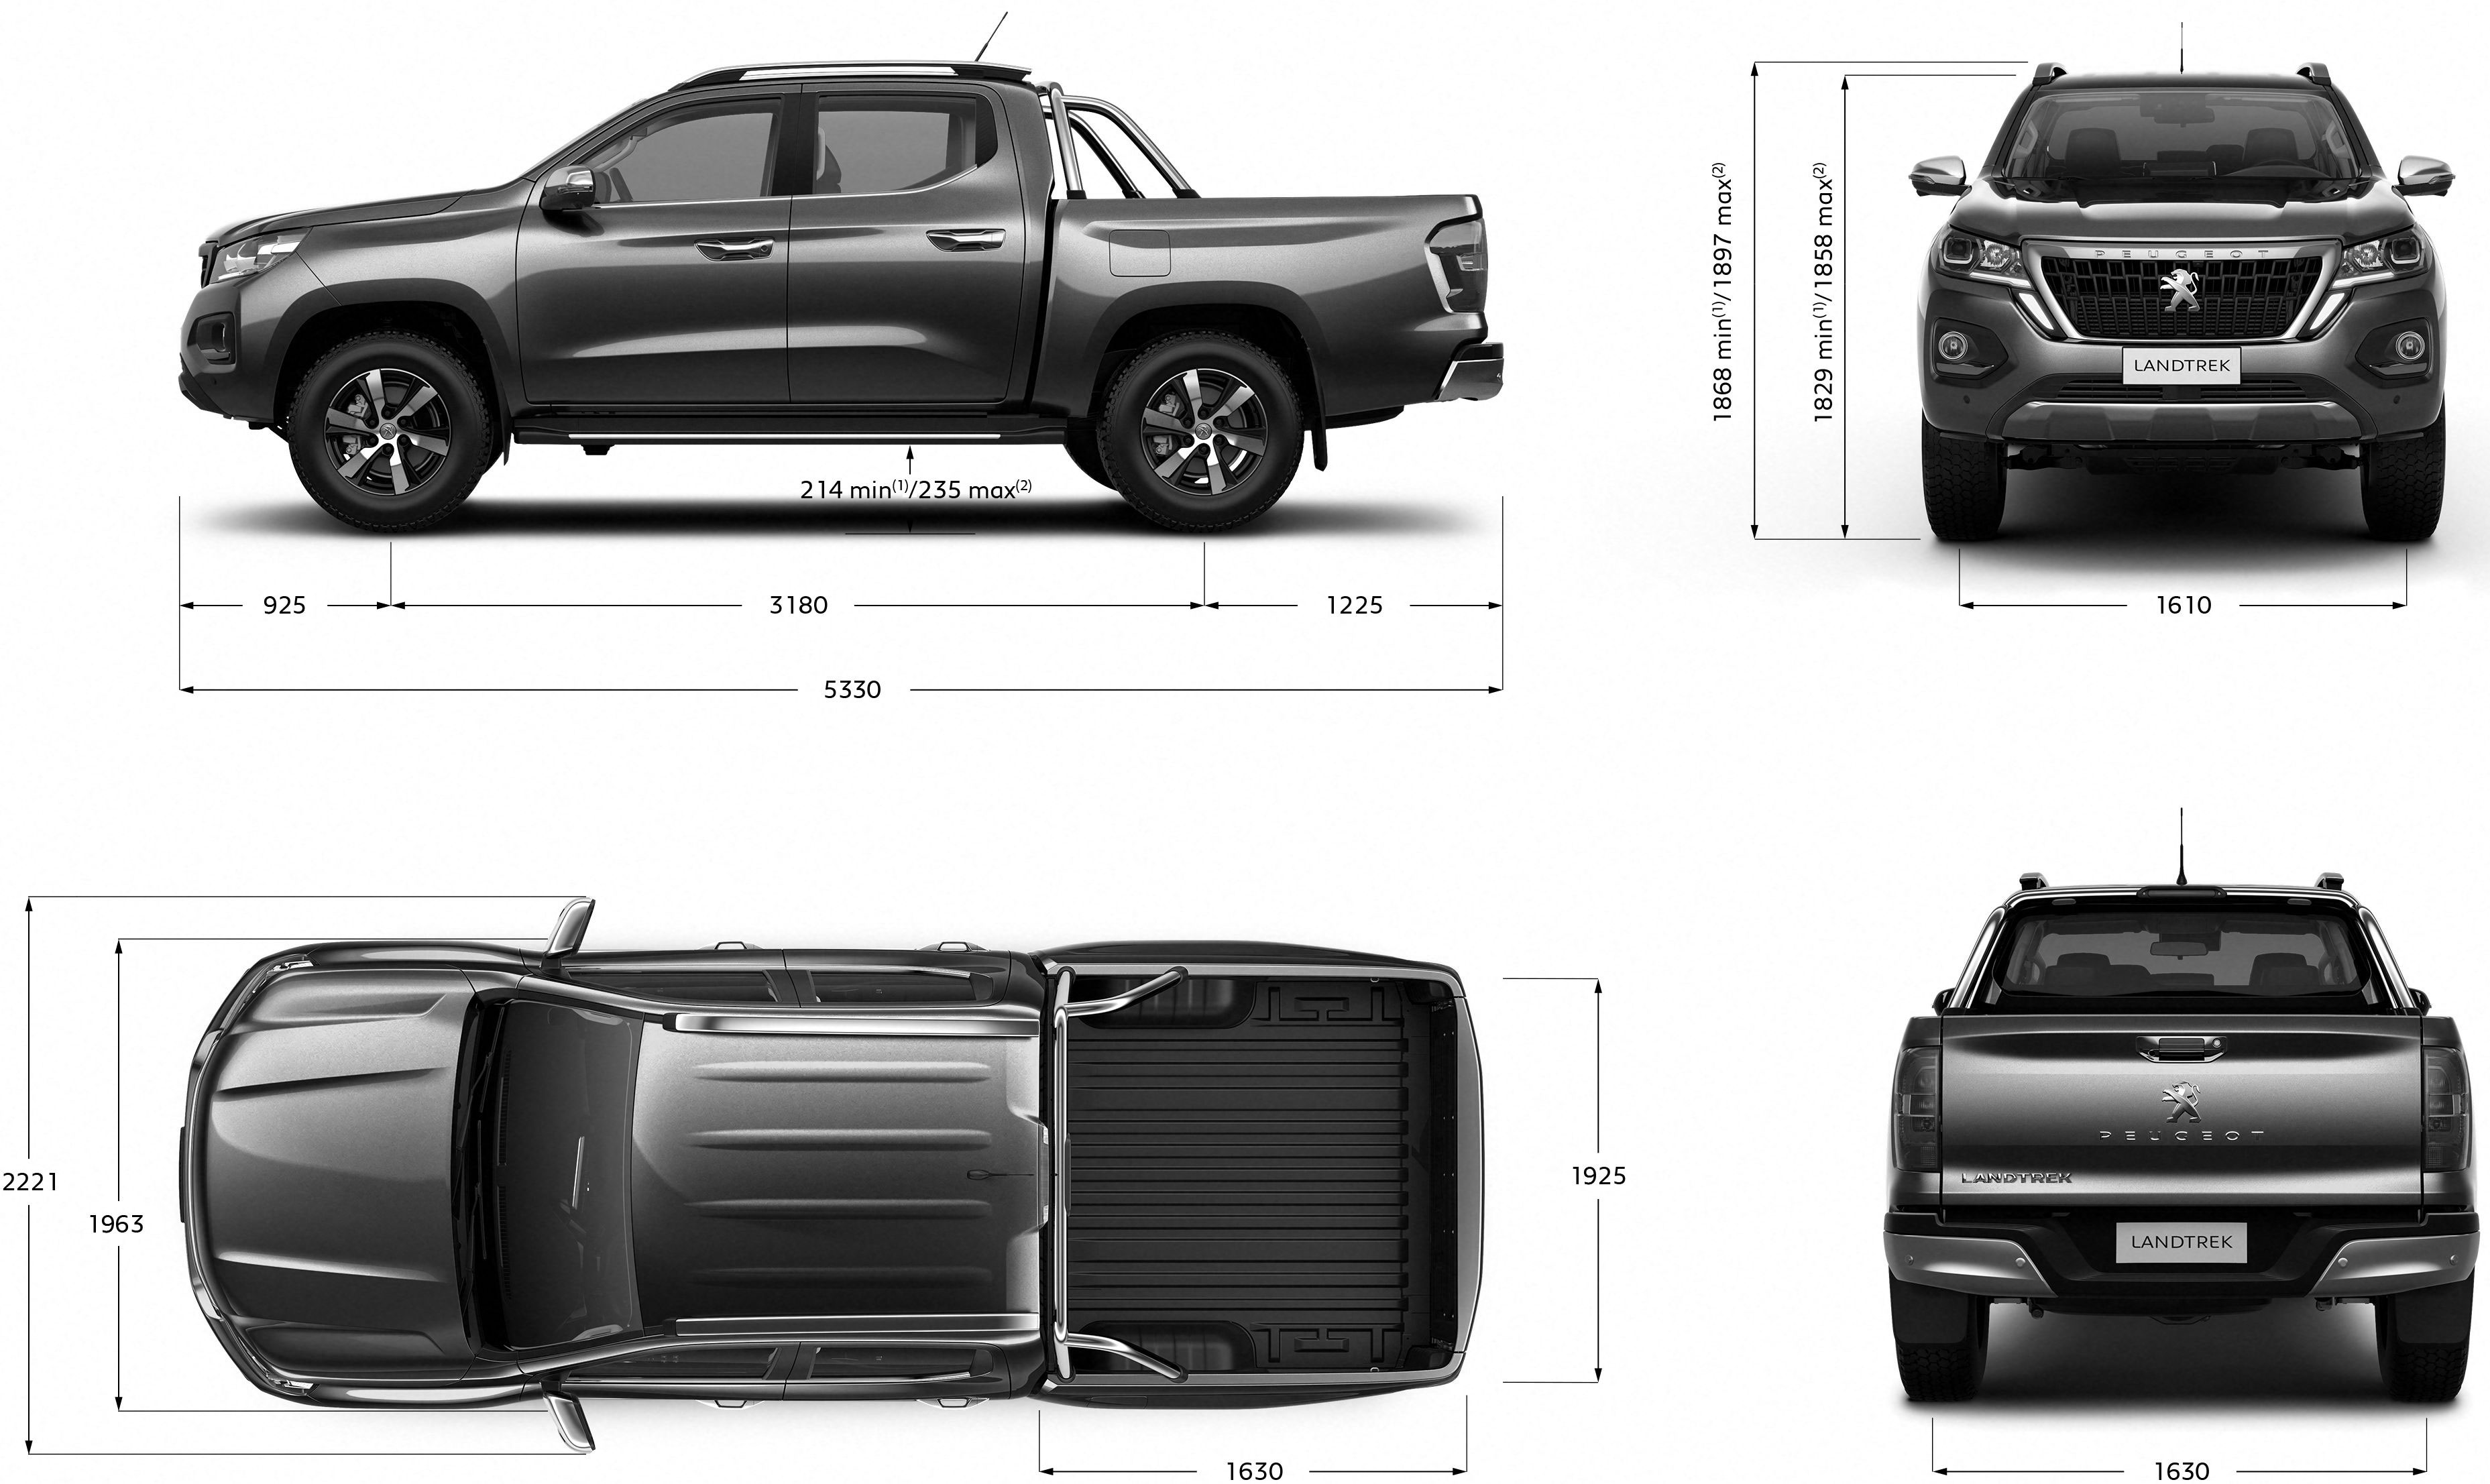 Peugeot Landtrek blueprint